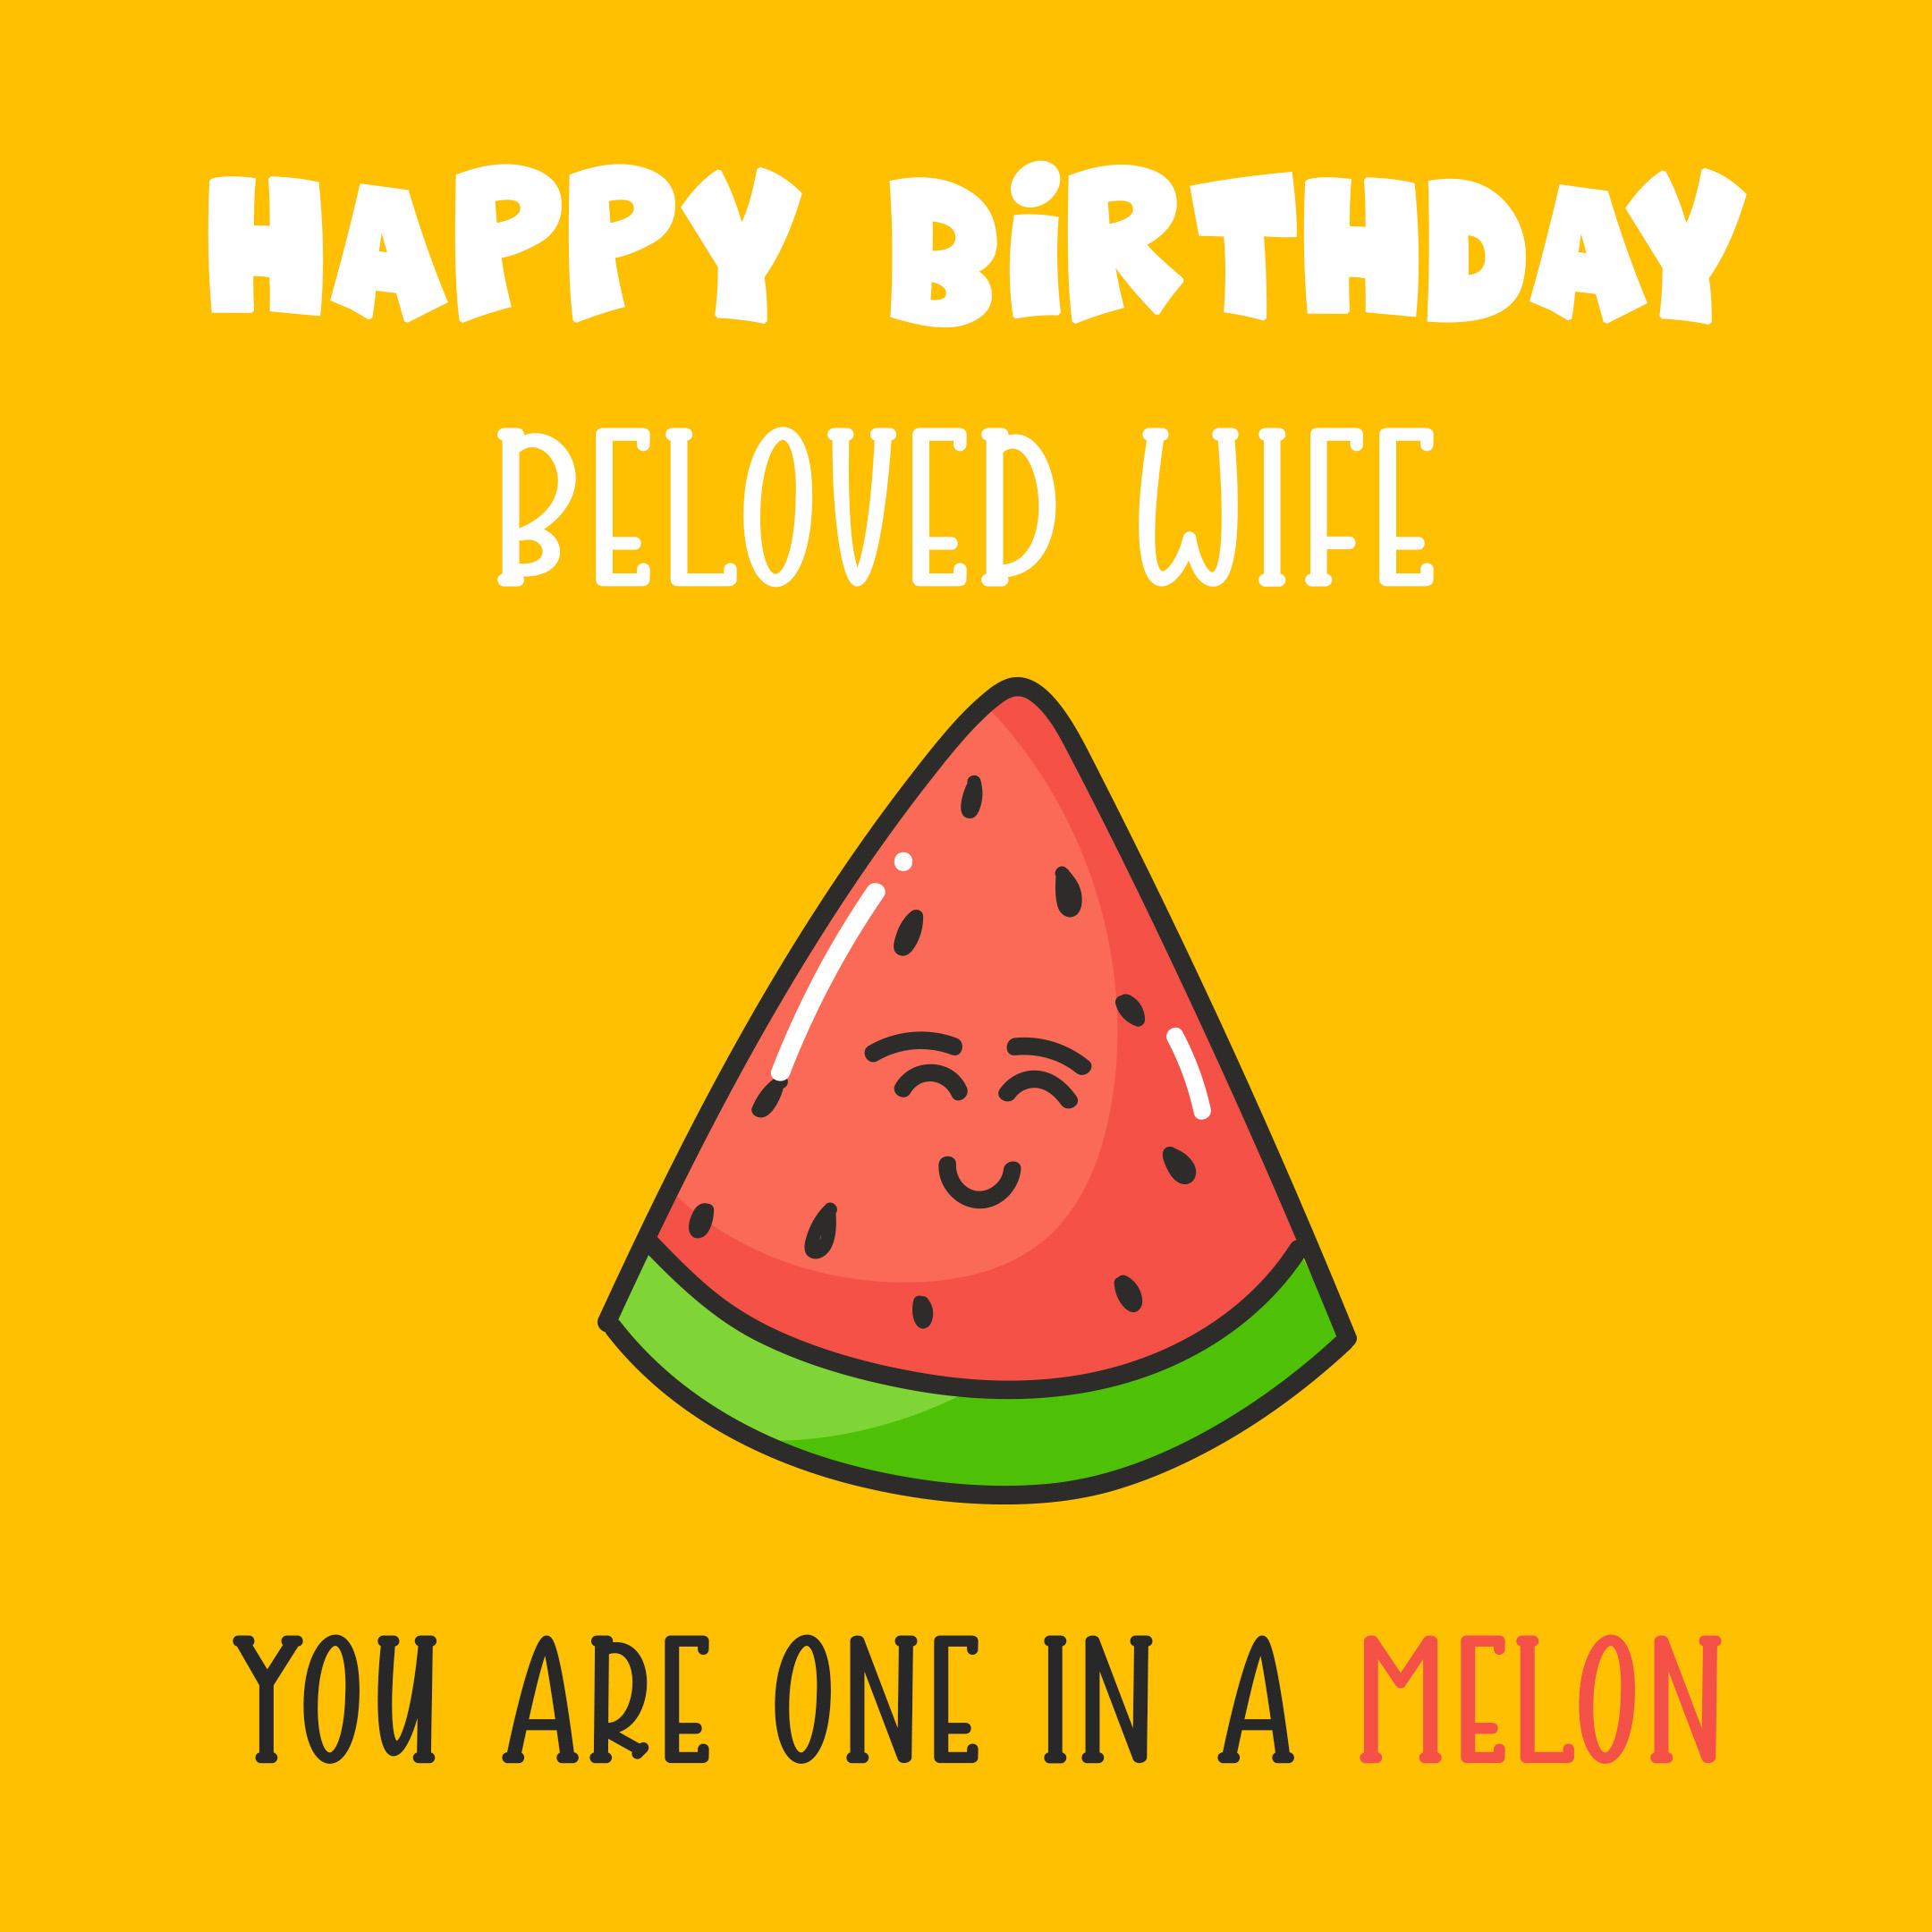 Free Cute Happy Birthday Image For Wife With Watermelon - birthdayimg.com